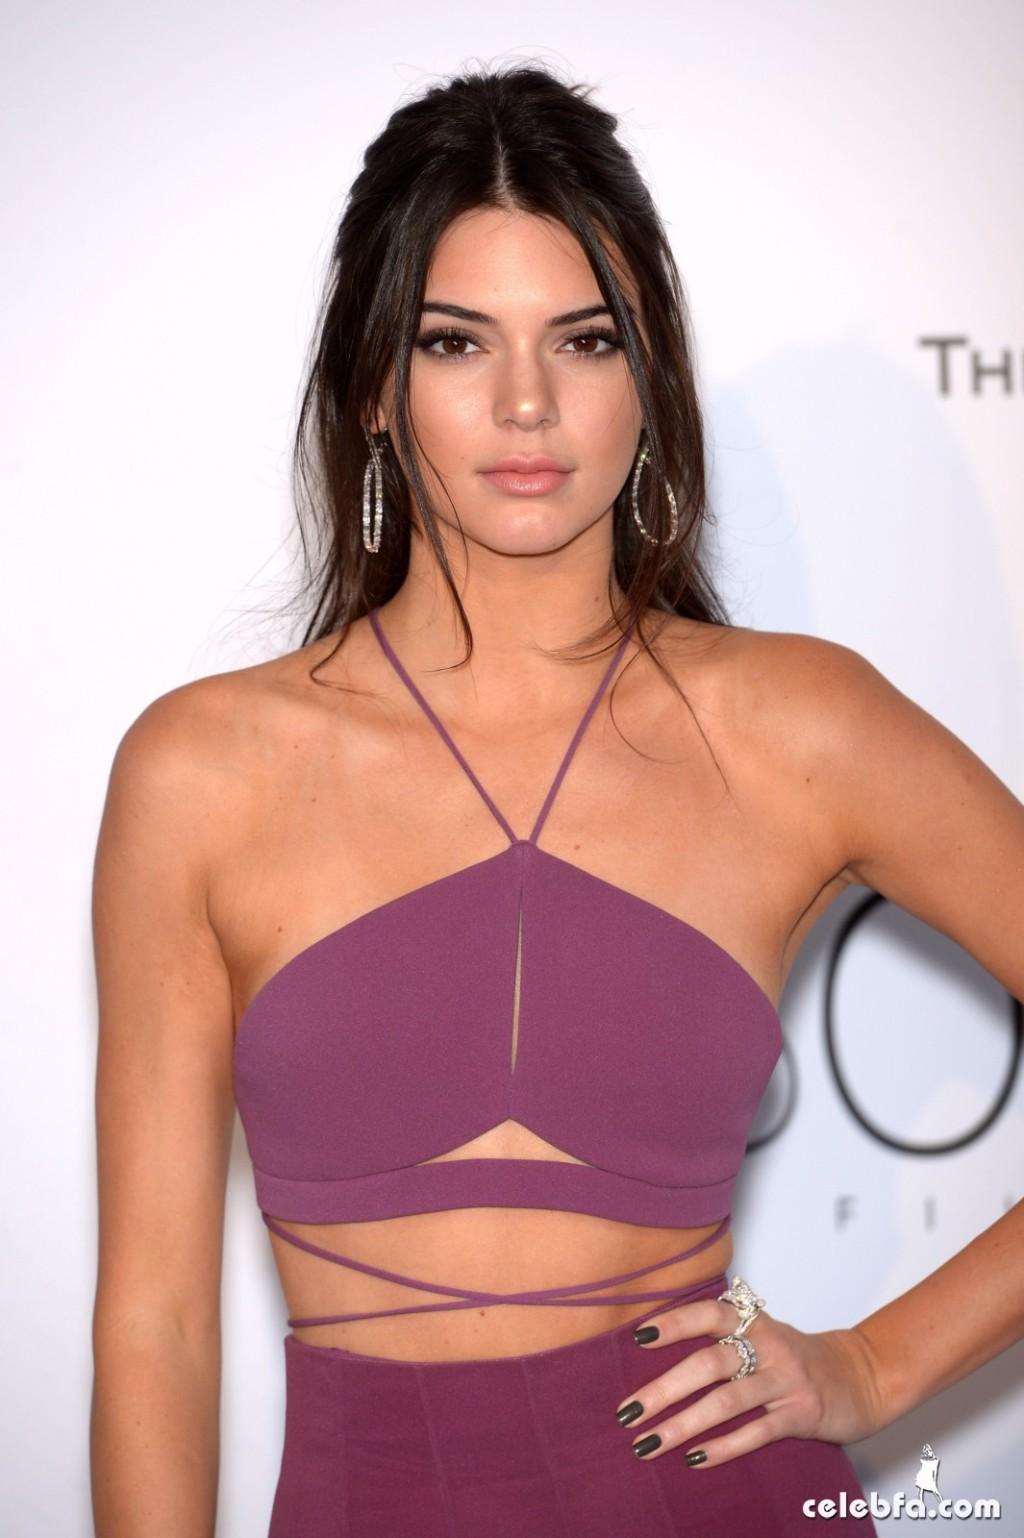 Kendall_Jenner_amfAR's Cannes Gala (13)